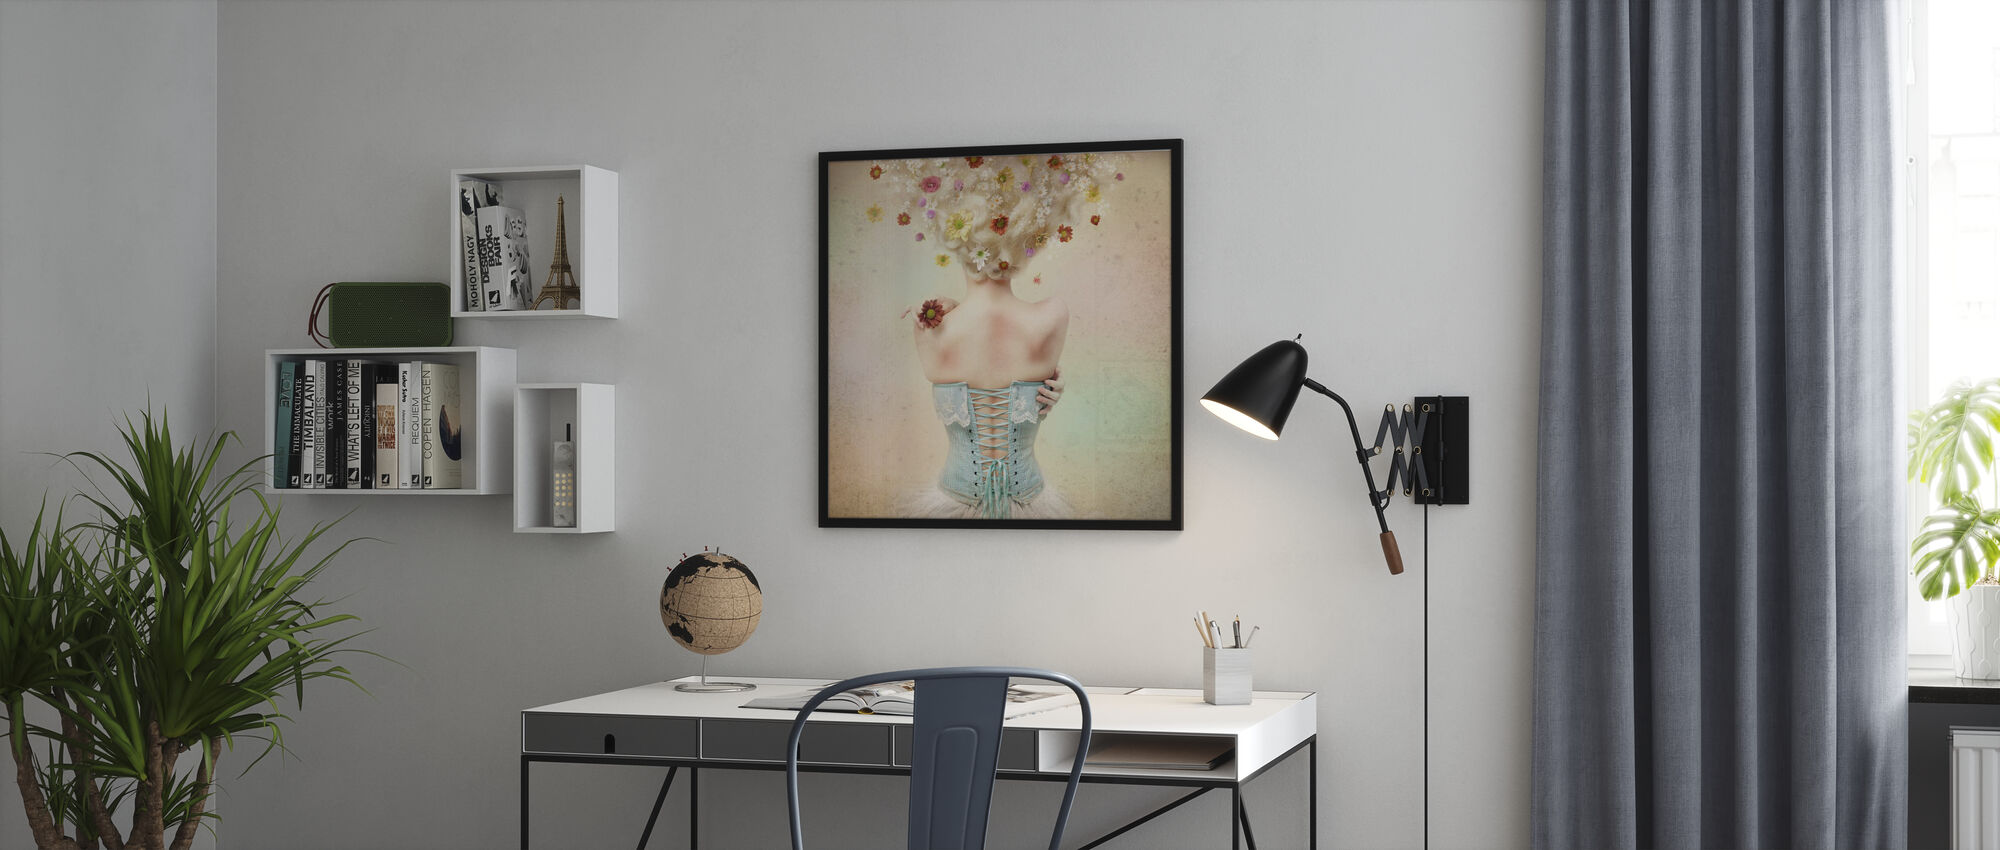 Mädchen des Blumengartens - Poster - Büro